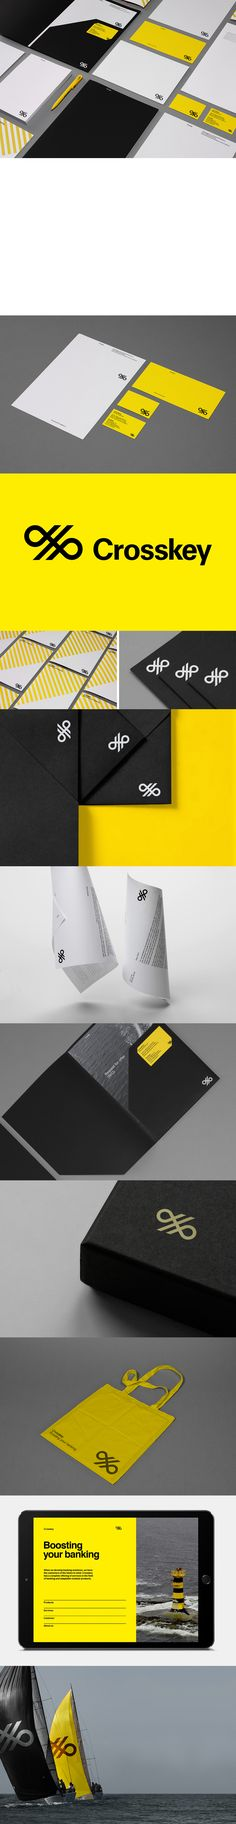 Crosskey brand by Kurppa Hosk